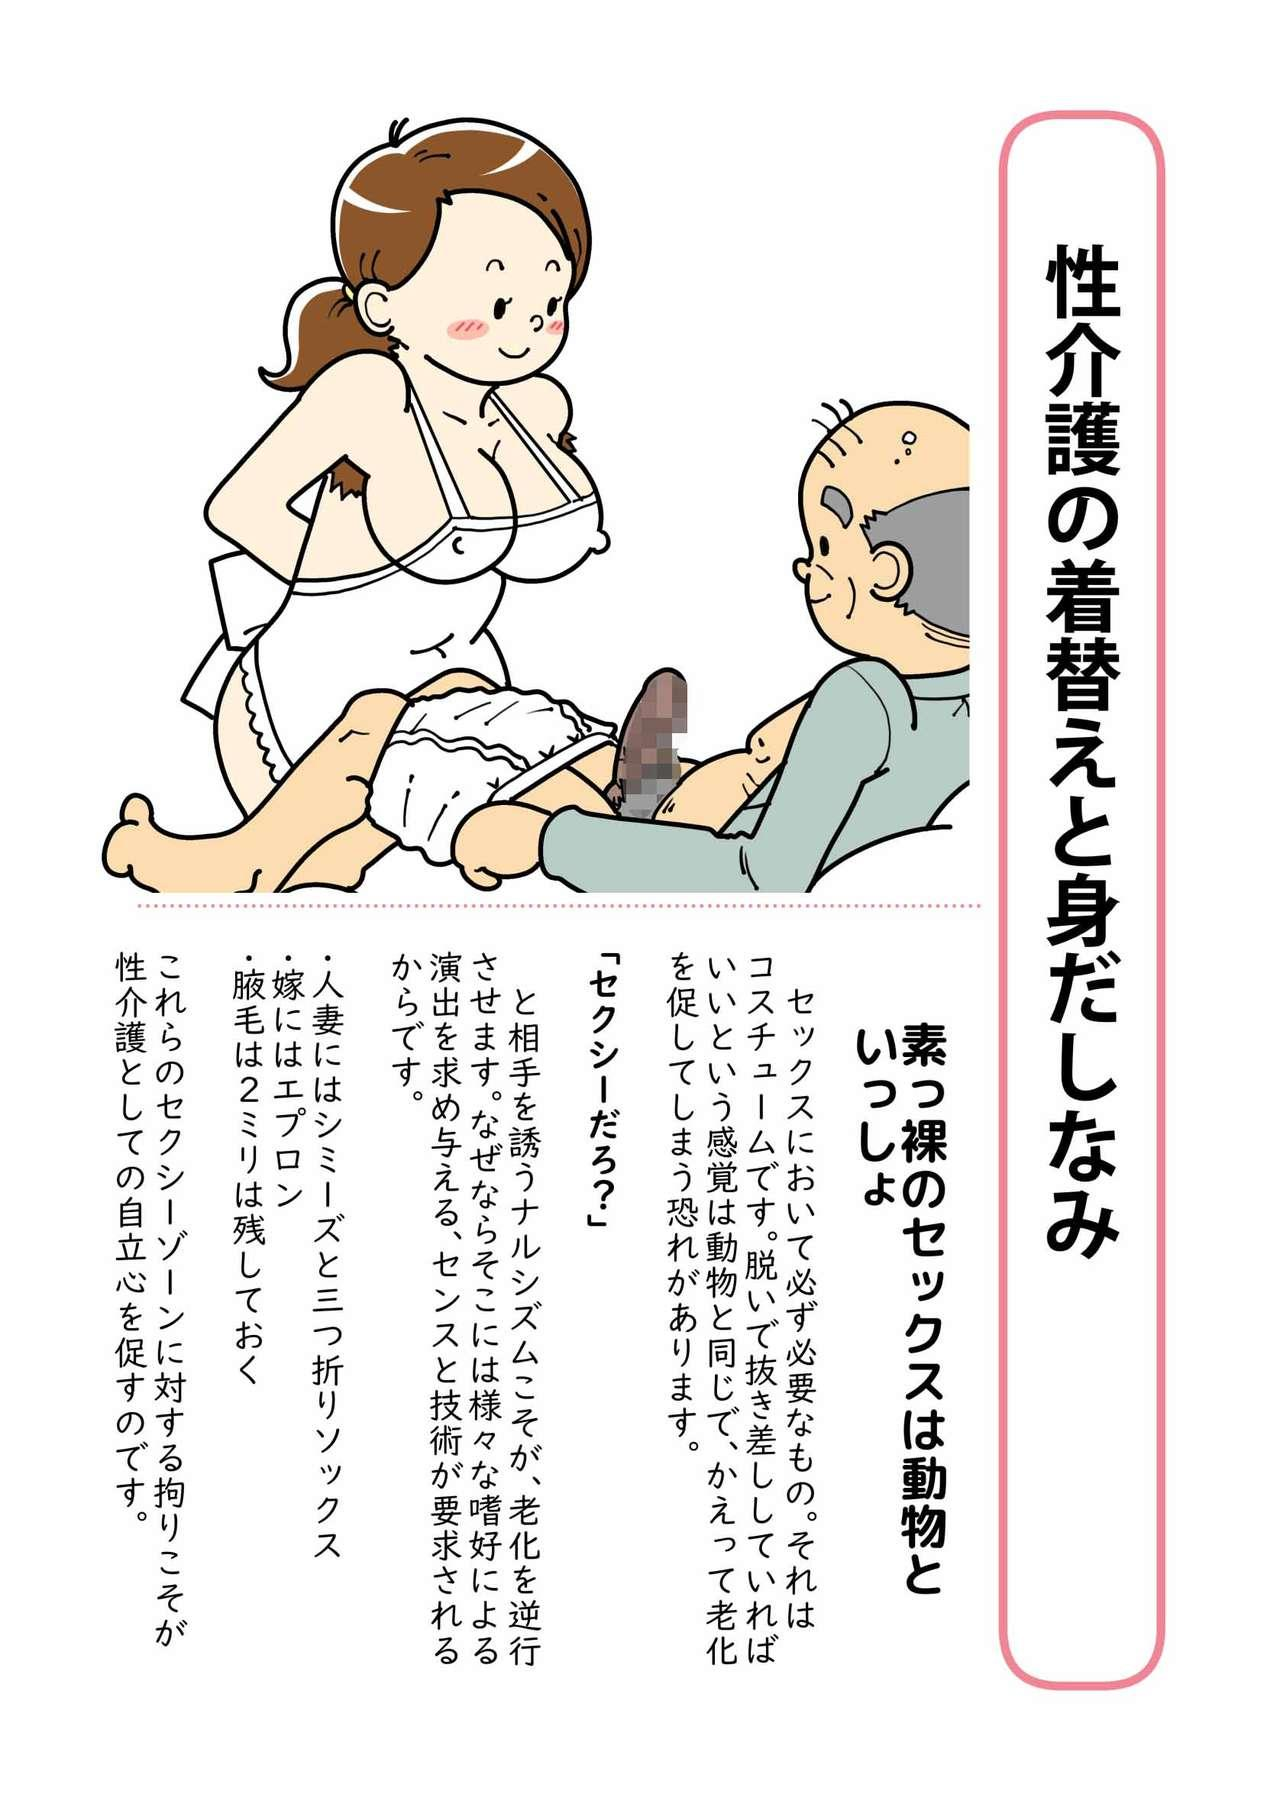 Isogasii Okaasan No Tamuno Sasa Rouzin Seikaigo | Guide for Elderly Sex Health Care to Busy Mom 25